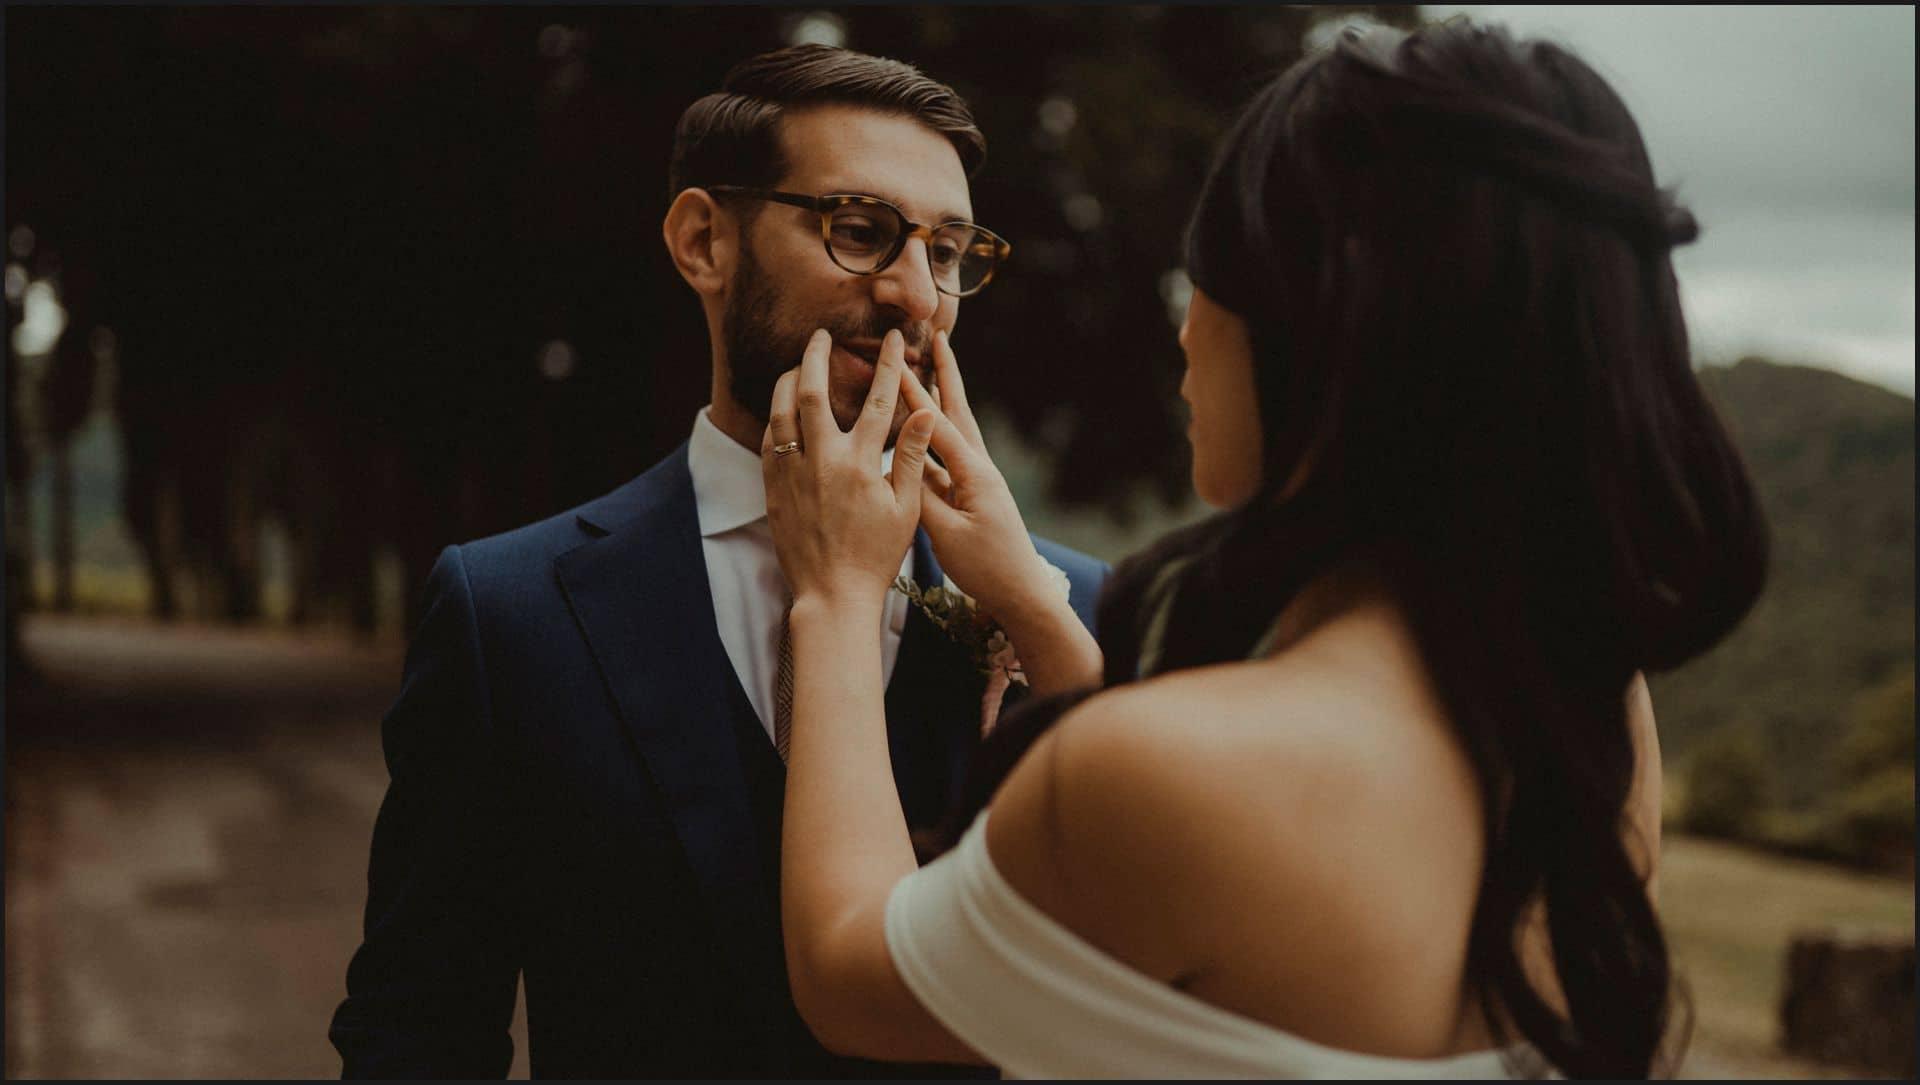 destination wedding, castello del trebbio, tuscany, bride, groom, intimate